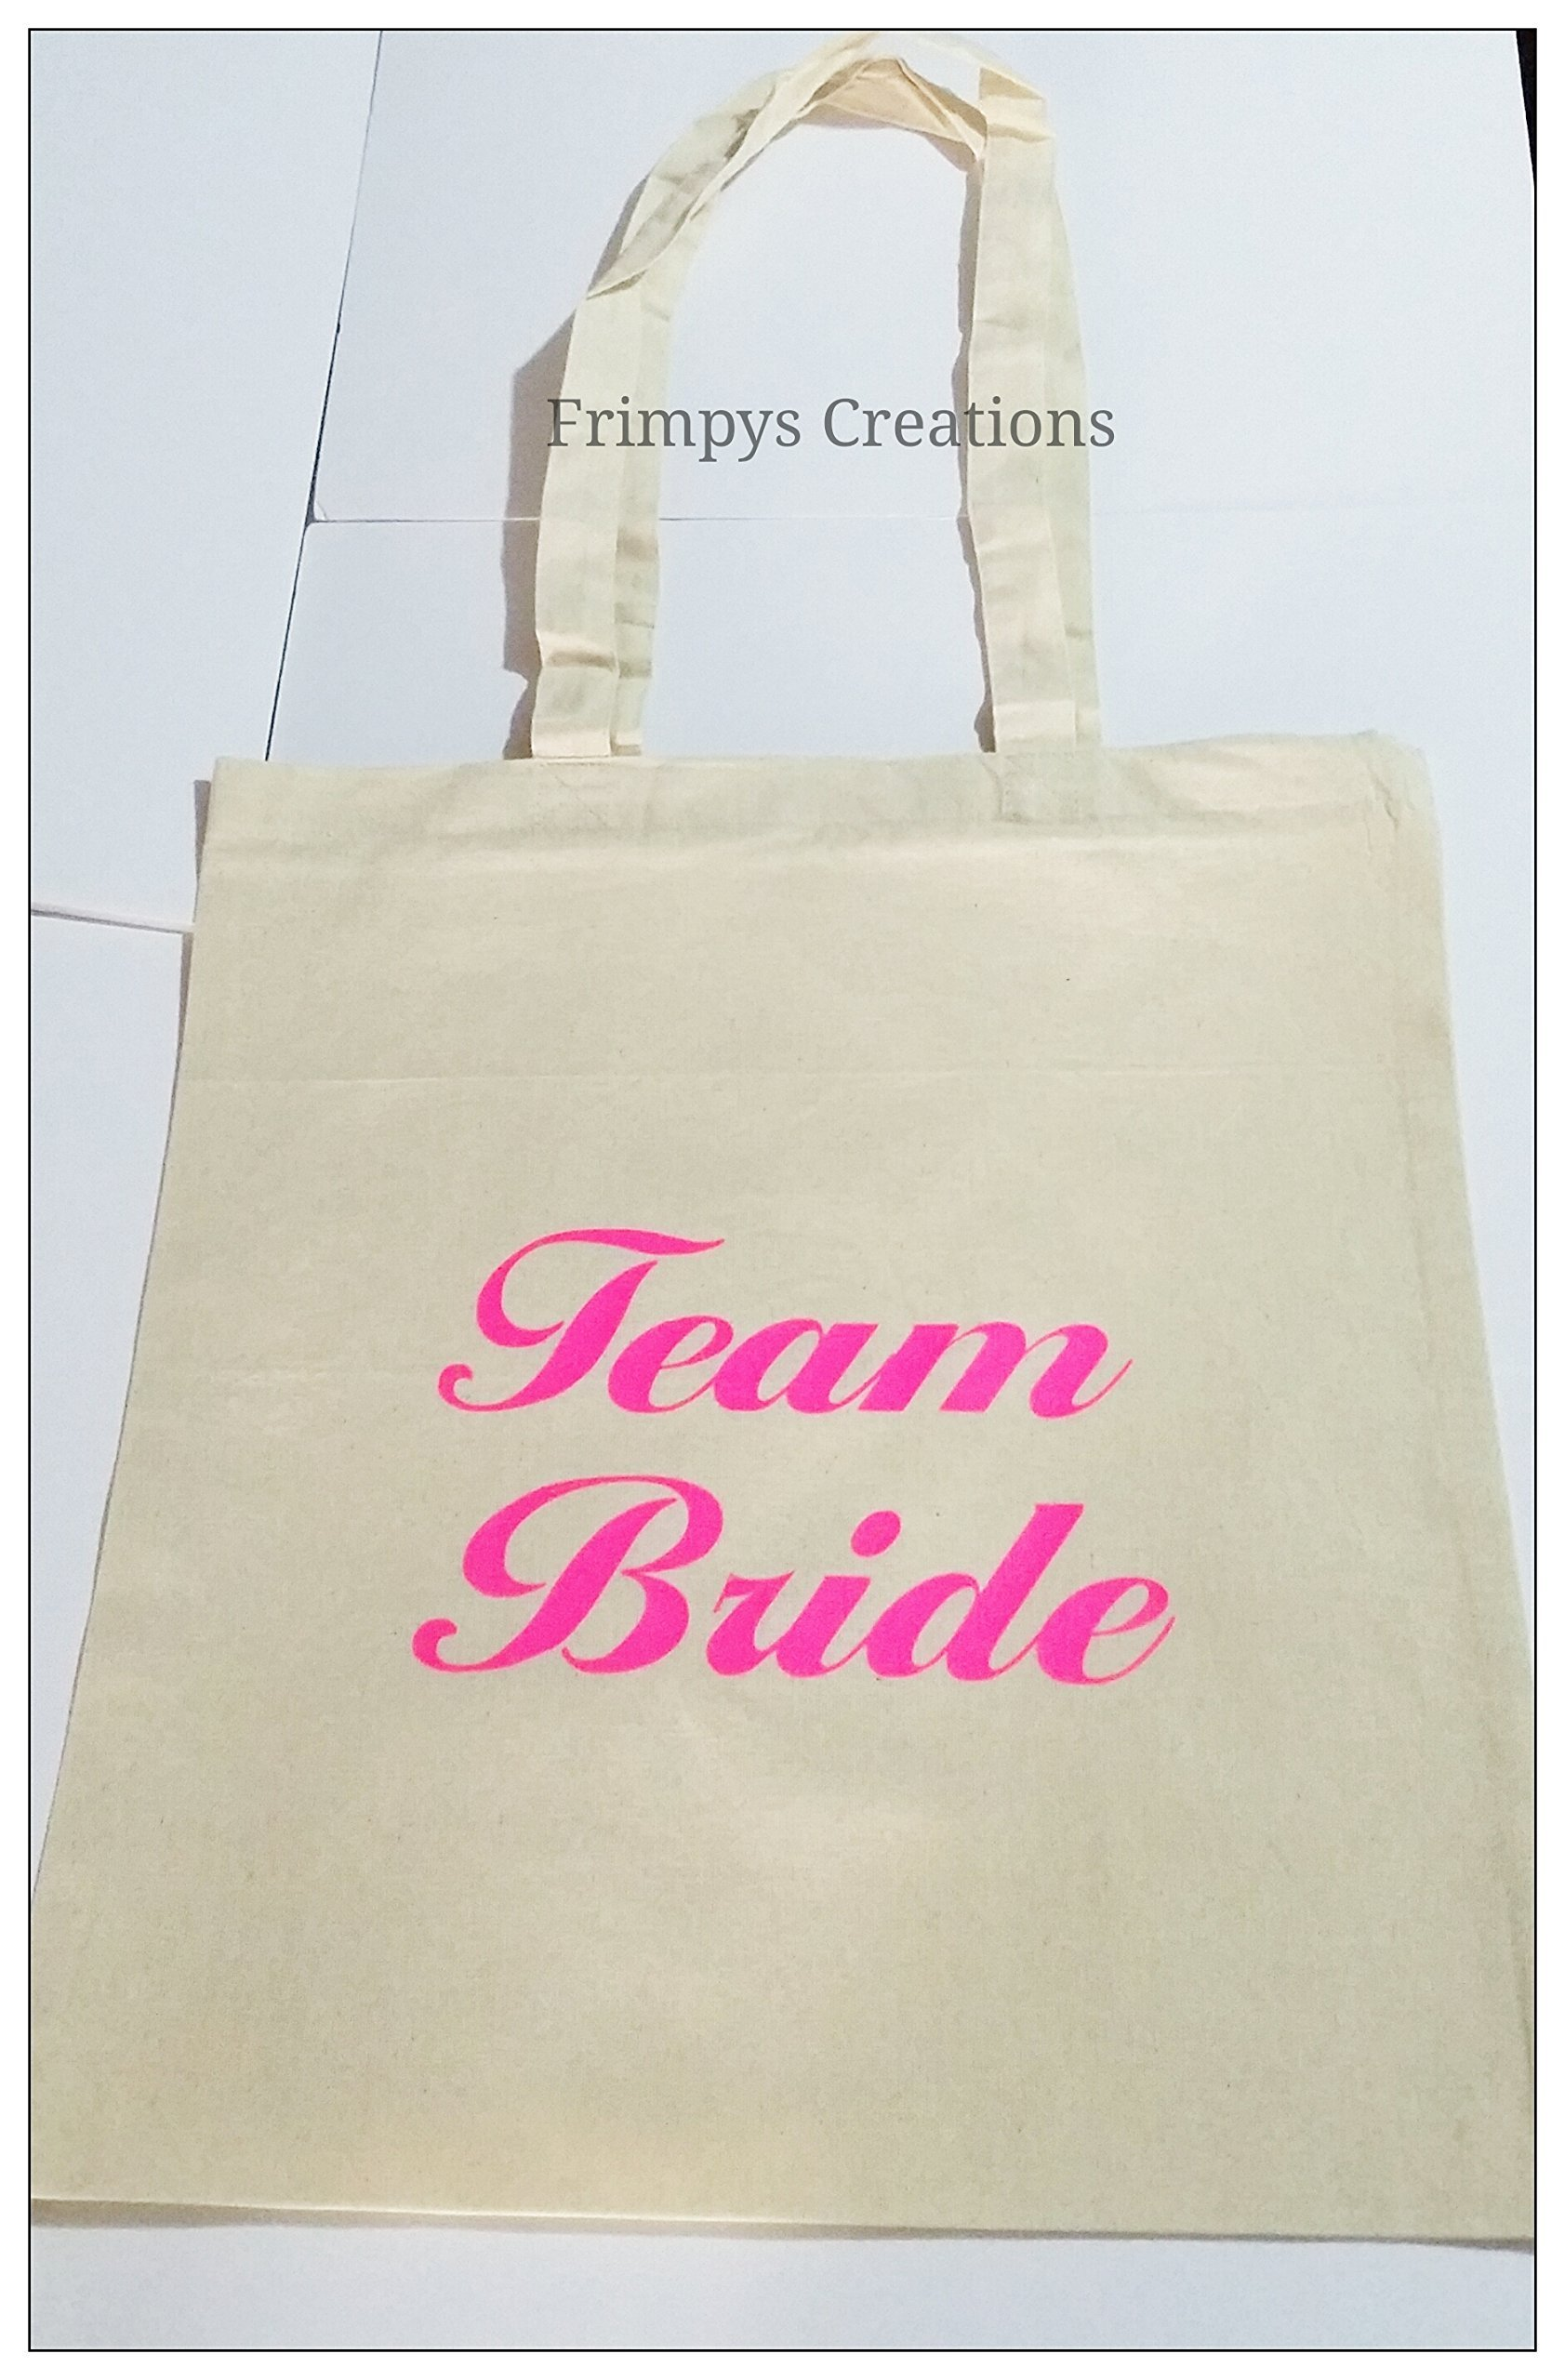 Wedding Favour Tote Bag cotton Printed Gift Present Keep Team Bride Novelty (BAG) - handmade-bags